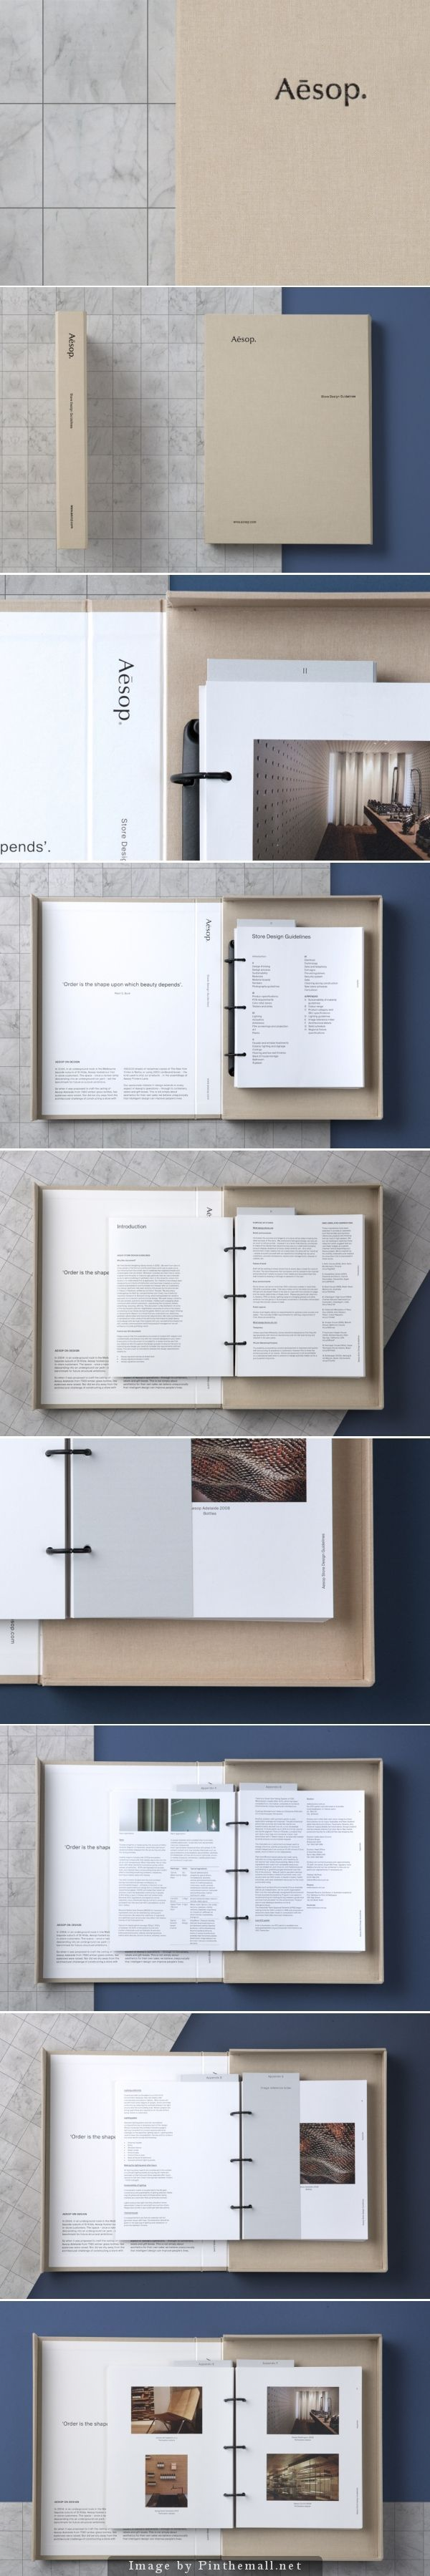 U-P – Design Guidelines for Aésop #branding #identity: